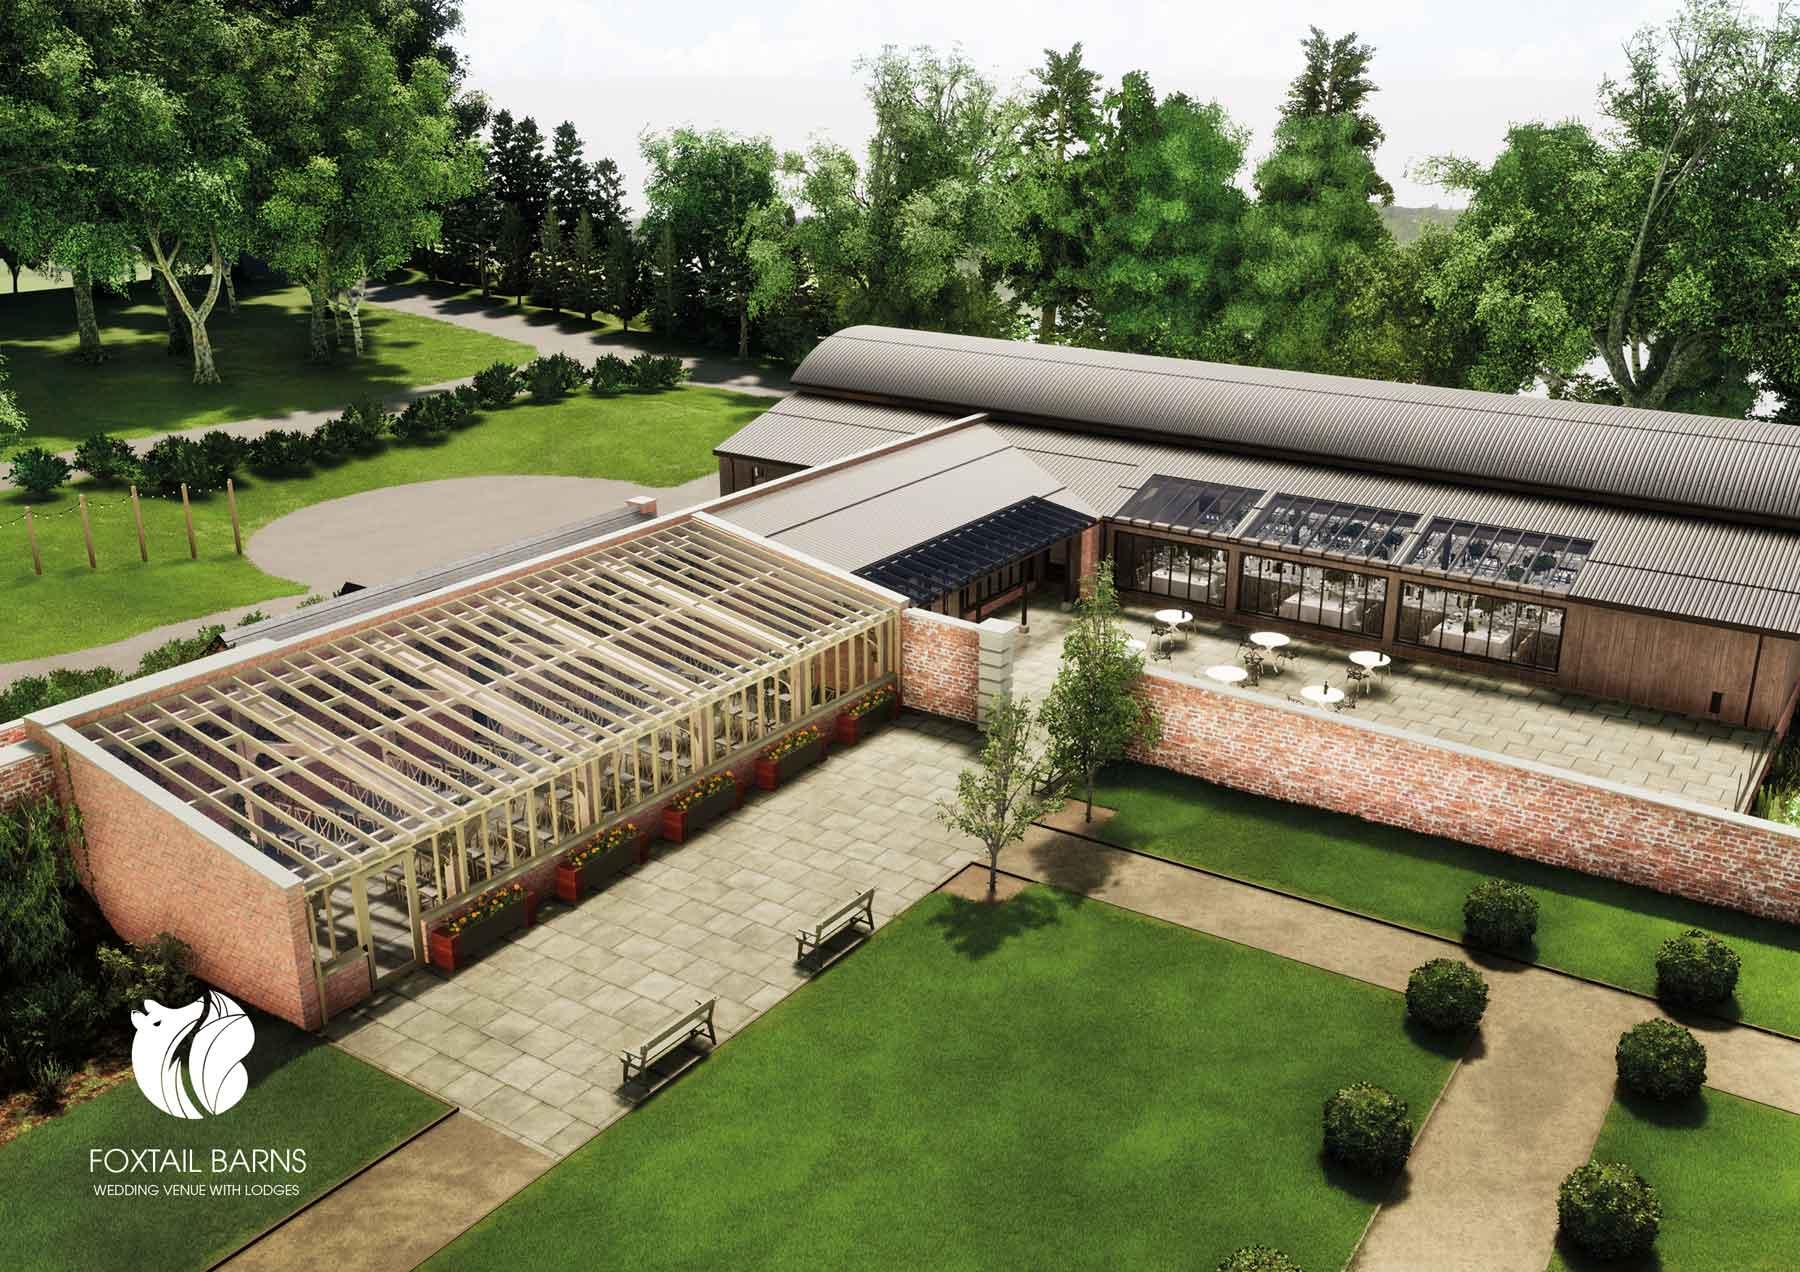 Barn Wedding Venues - New Foxtail Barns Wedding Venue